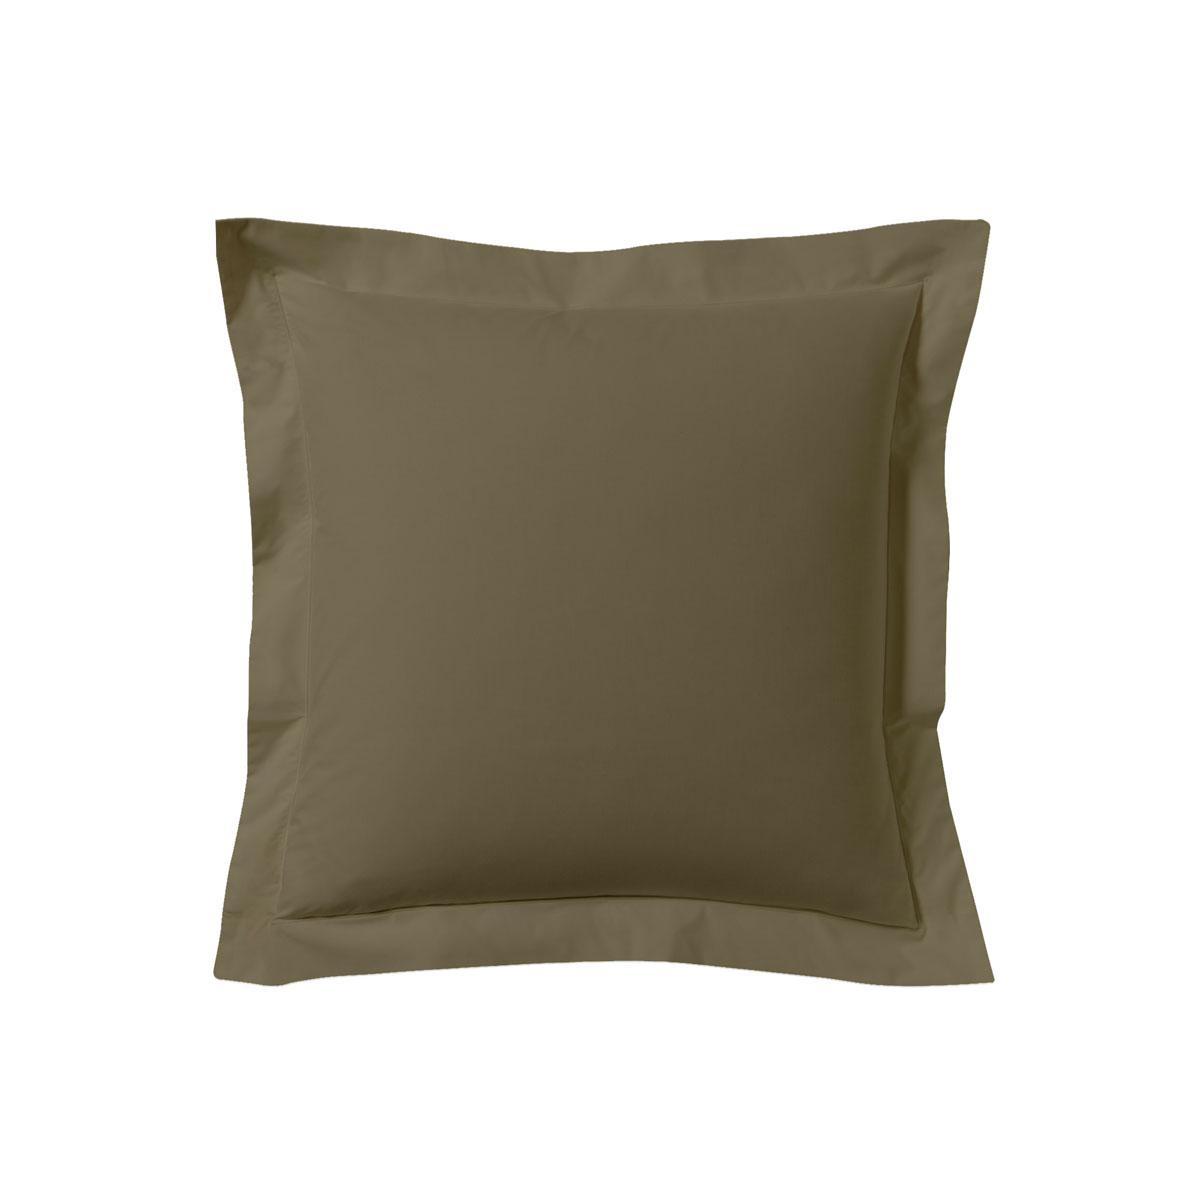 Taie d'oreiller unie en coton pralin 63x63